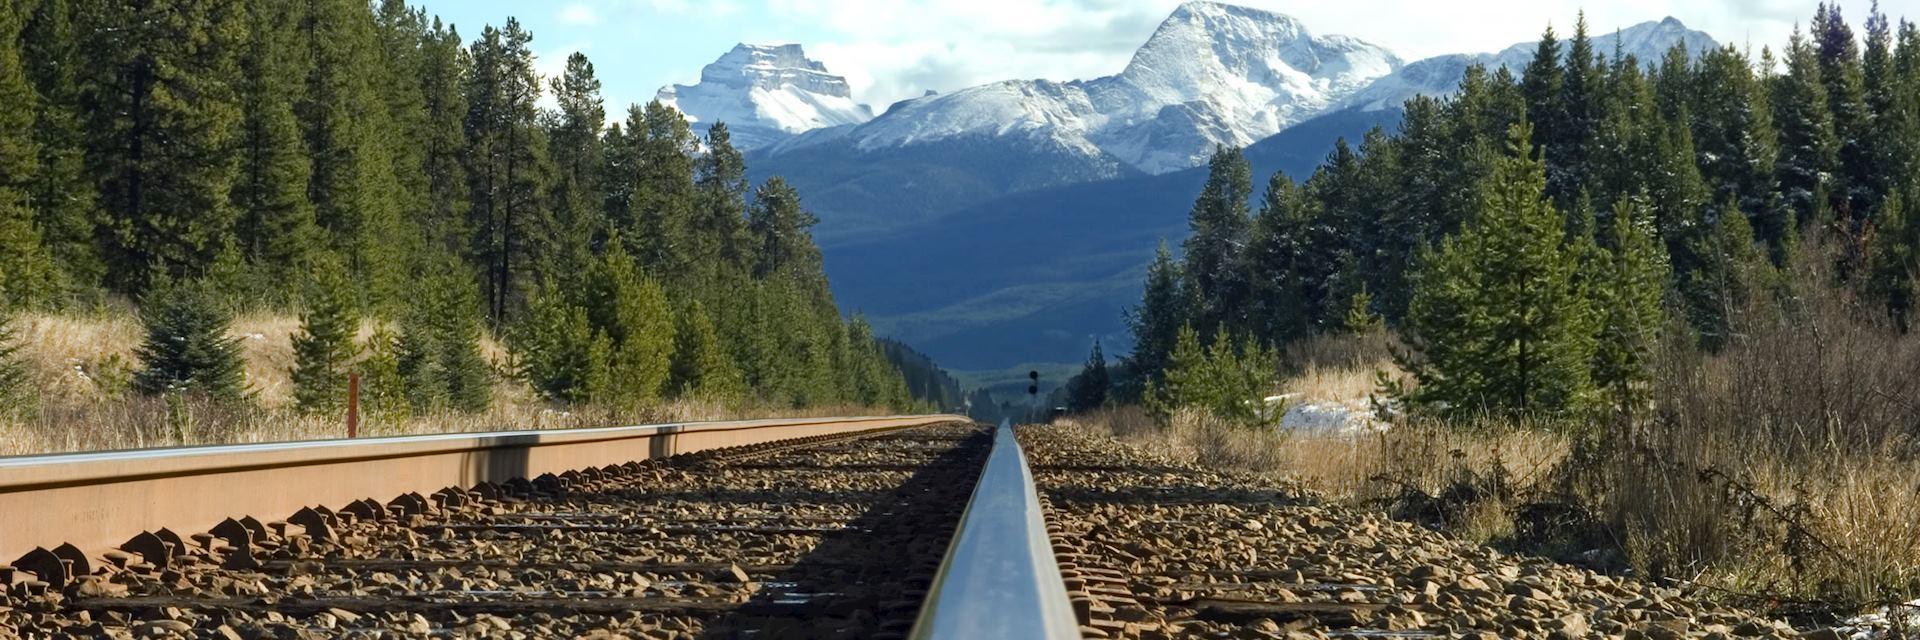 Train tracks carve their way through Canada's Rockies